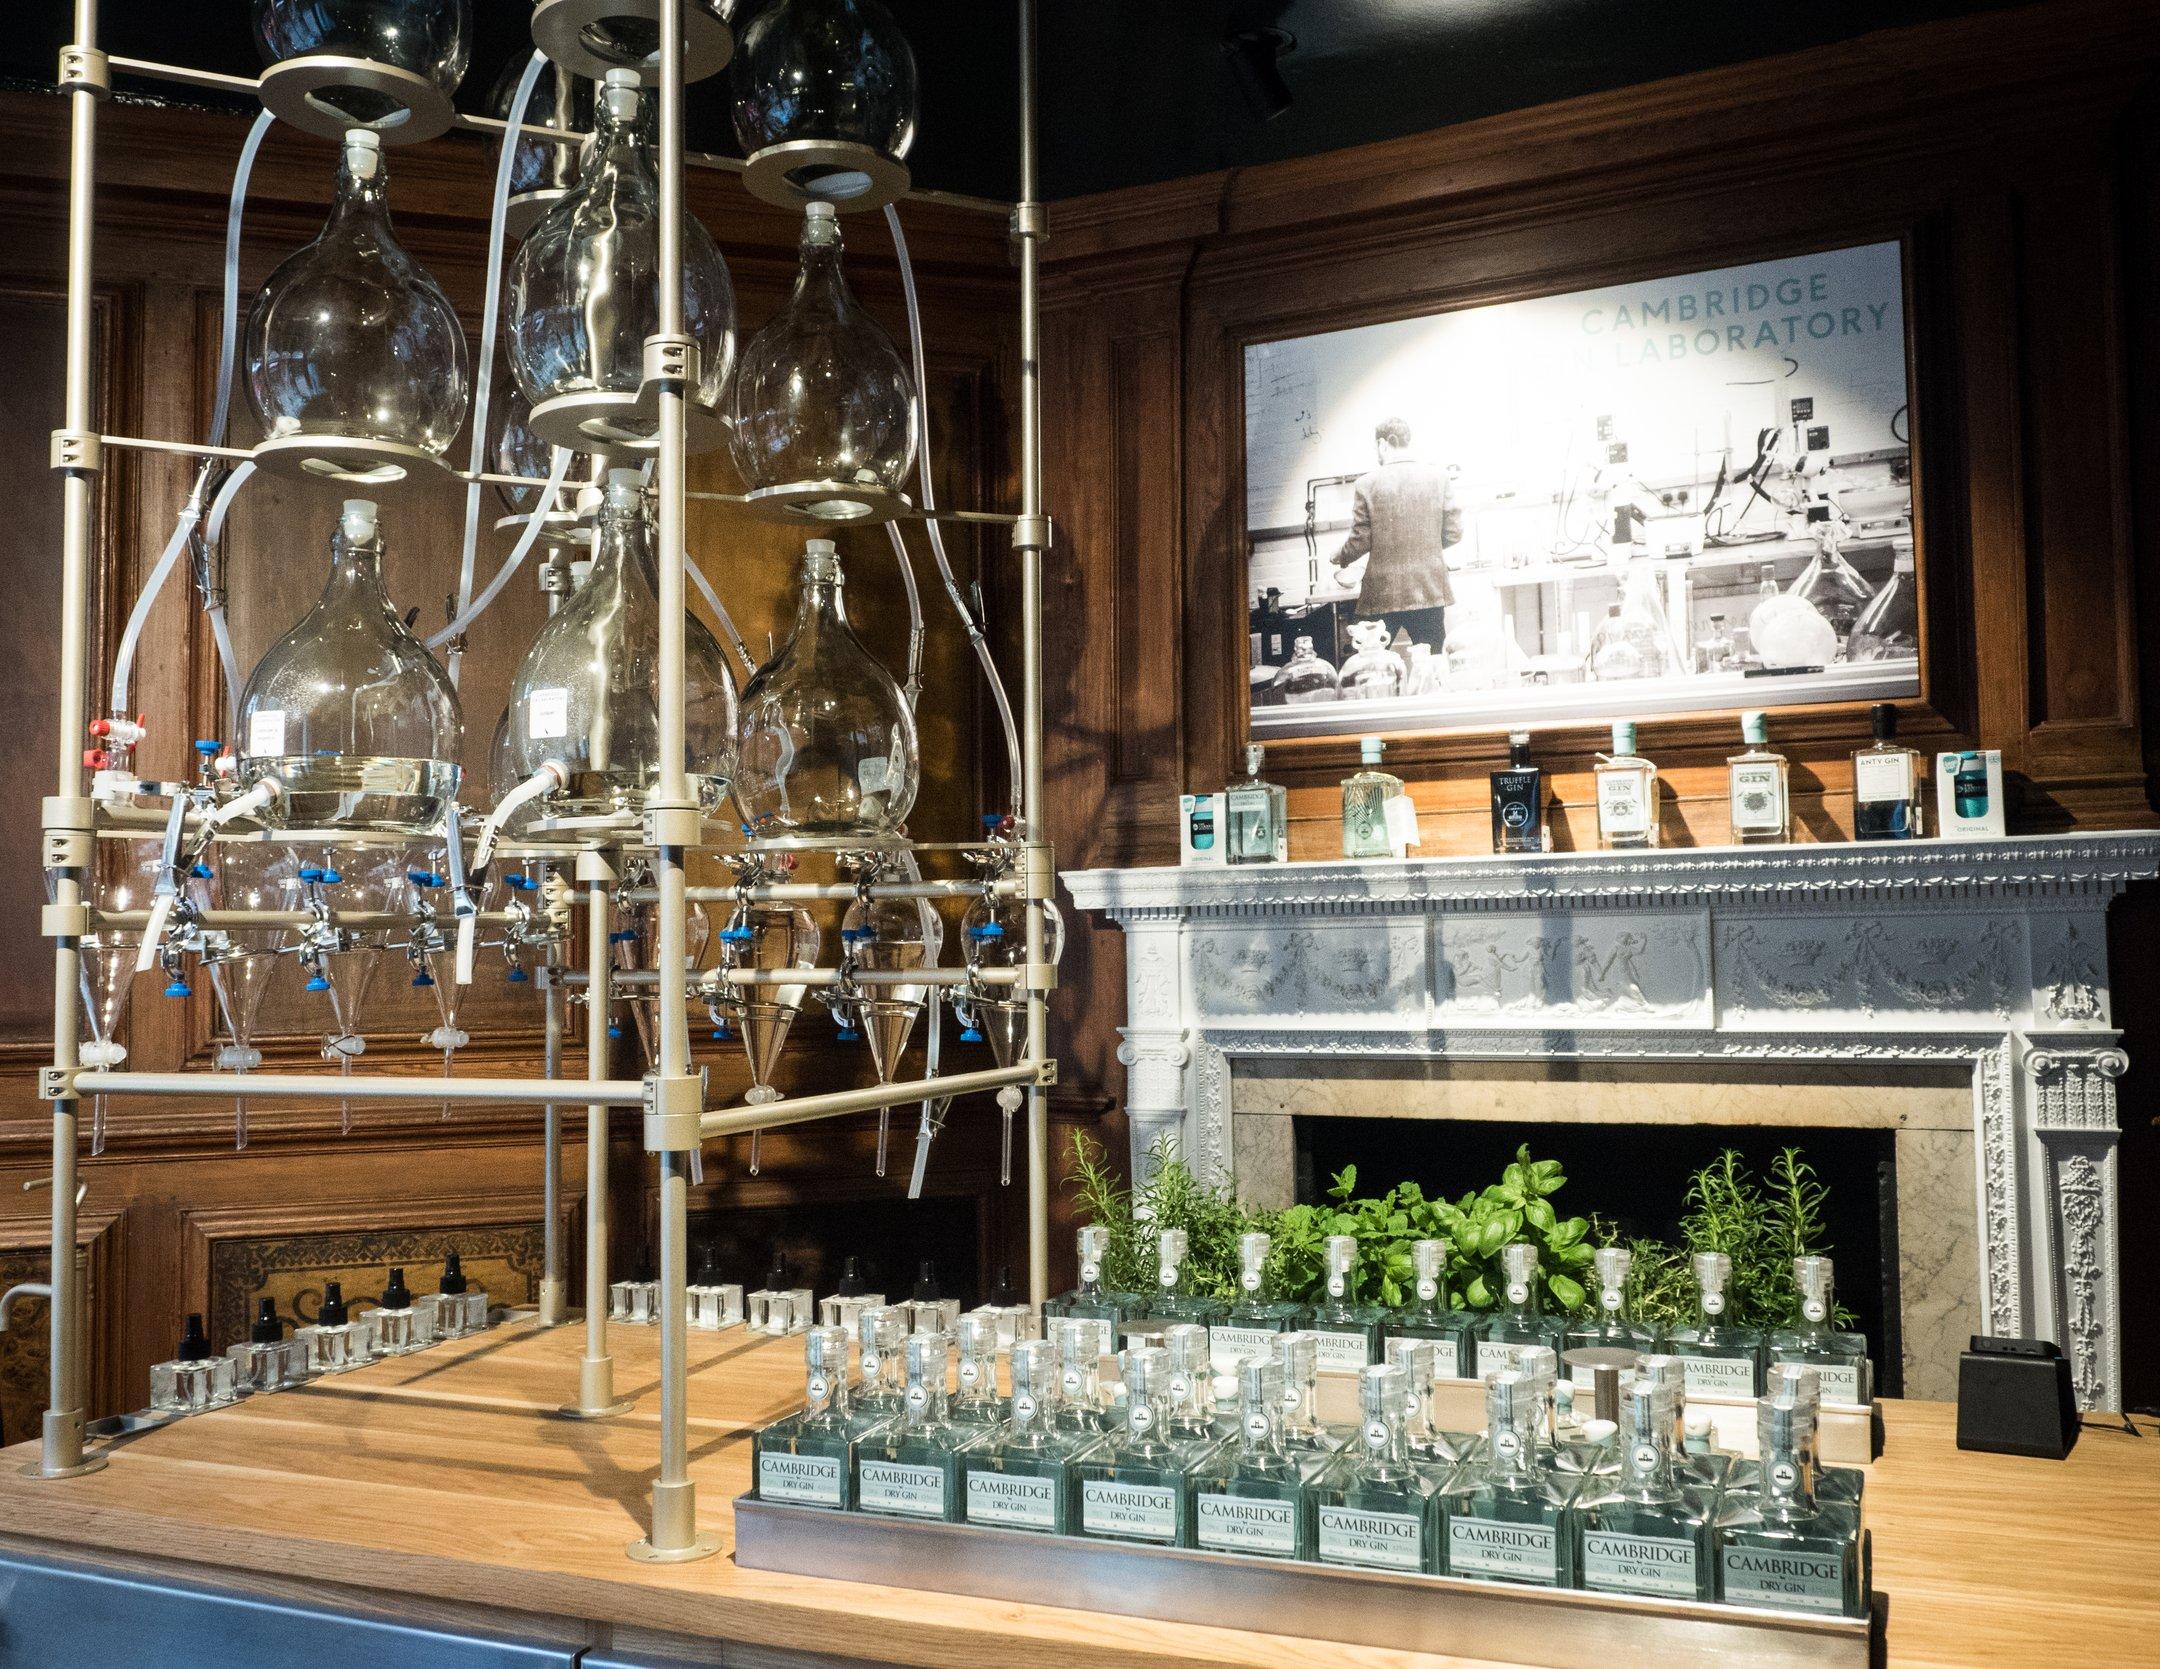 Cambridge Distillery has its own Laboratory